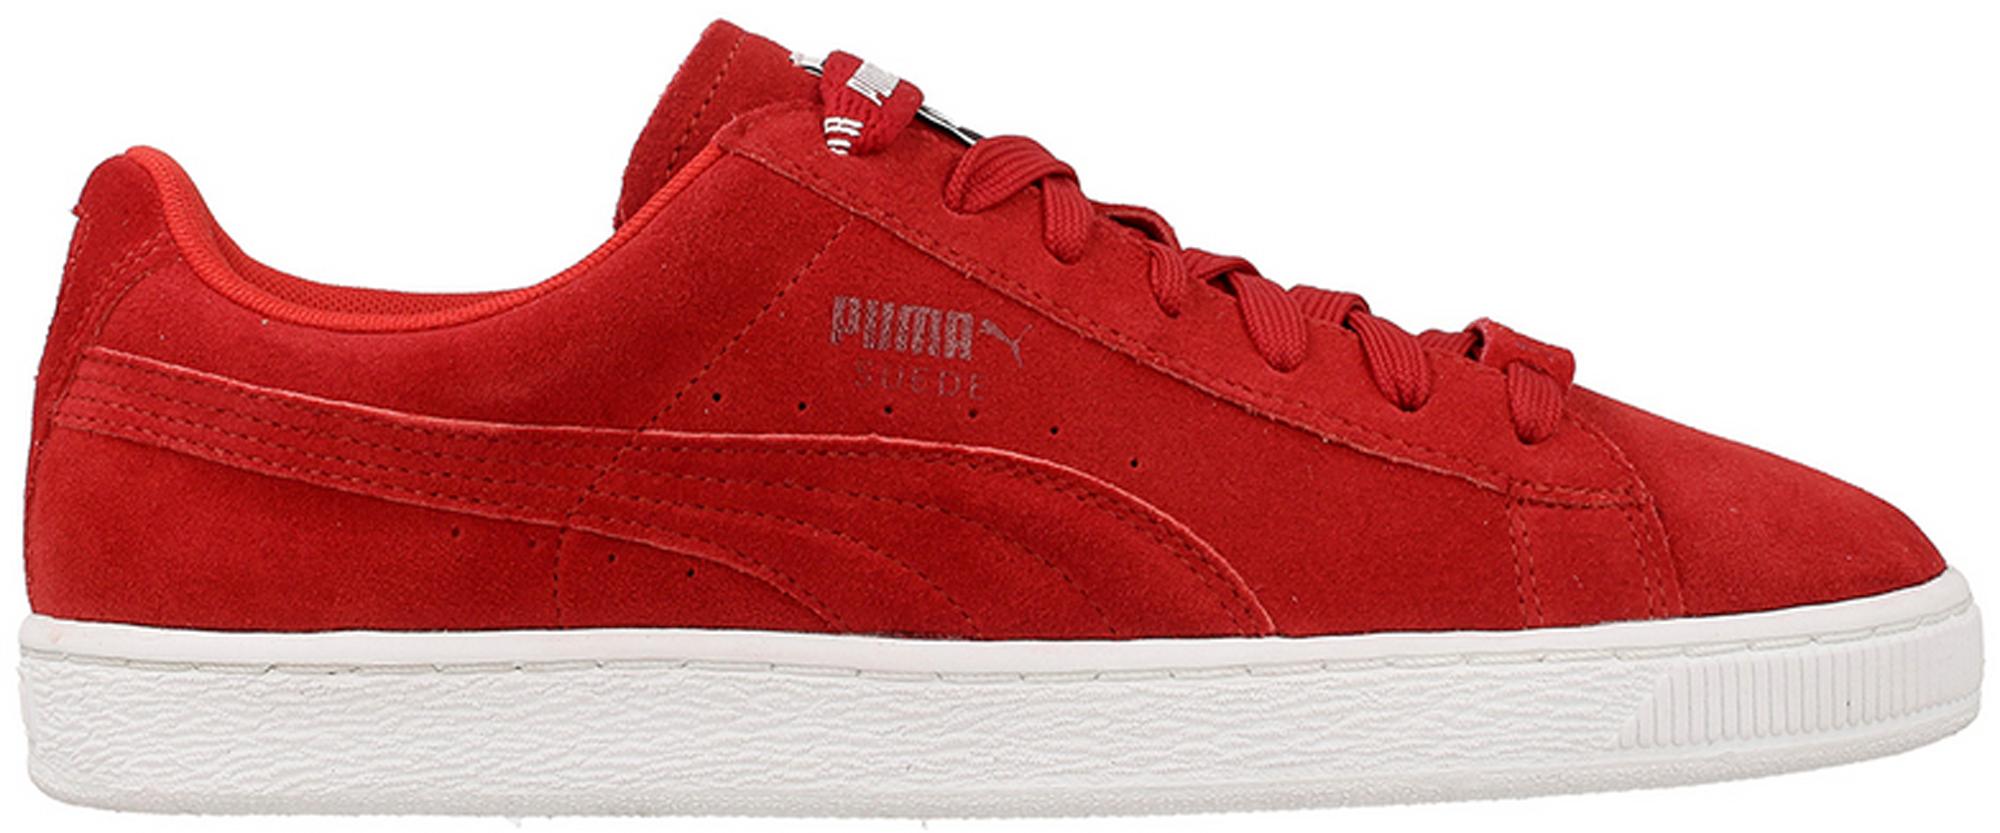 Puma Clyde Trapstar Red - 361500-02